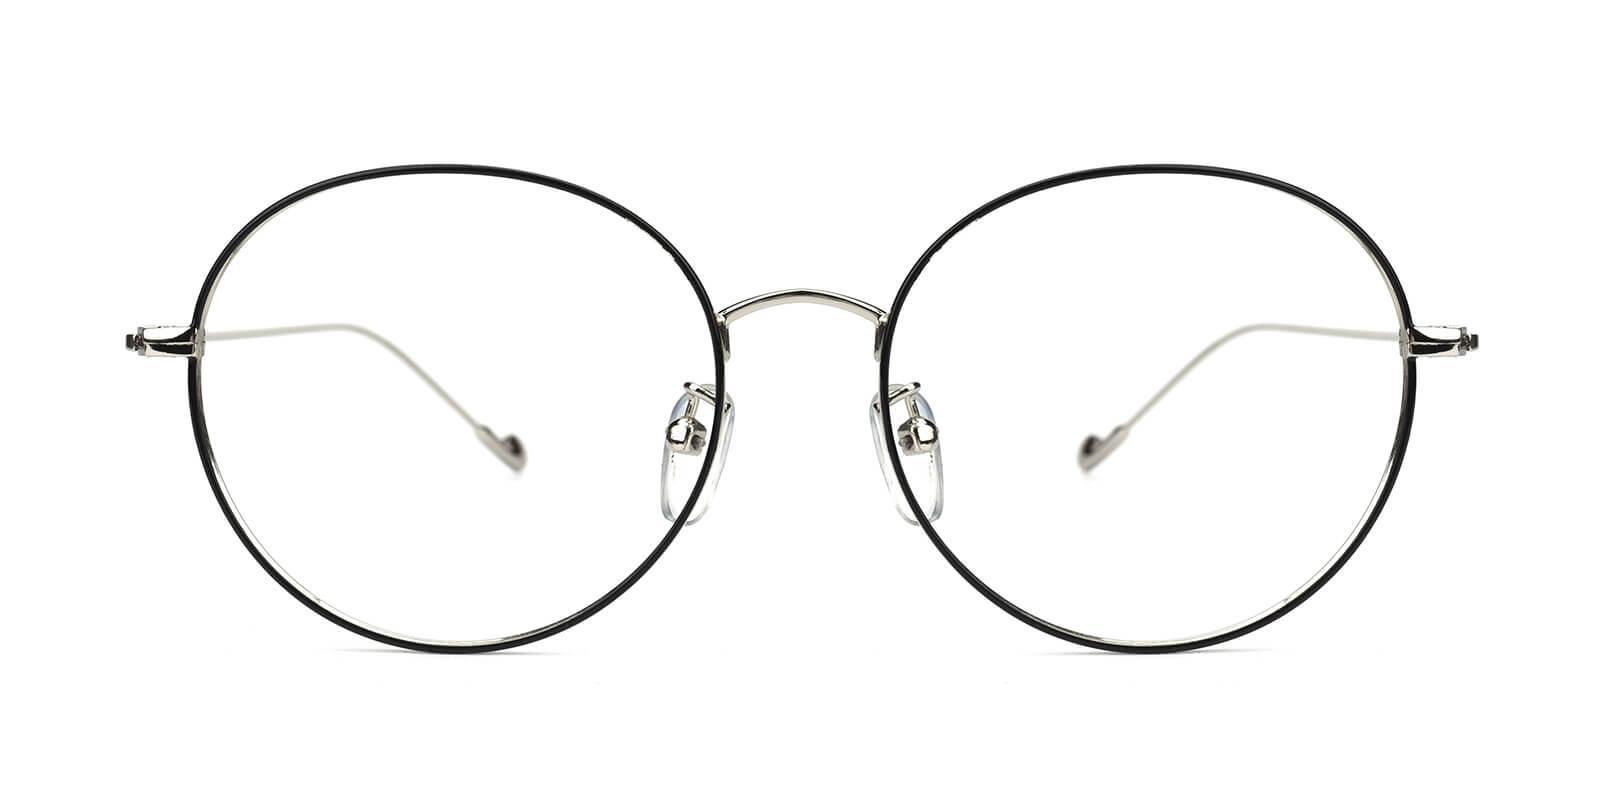 Jessy-Black-Round-Metal-Eyeglasses-additional2